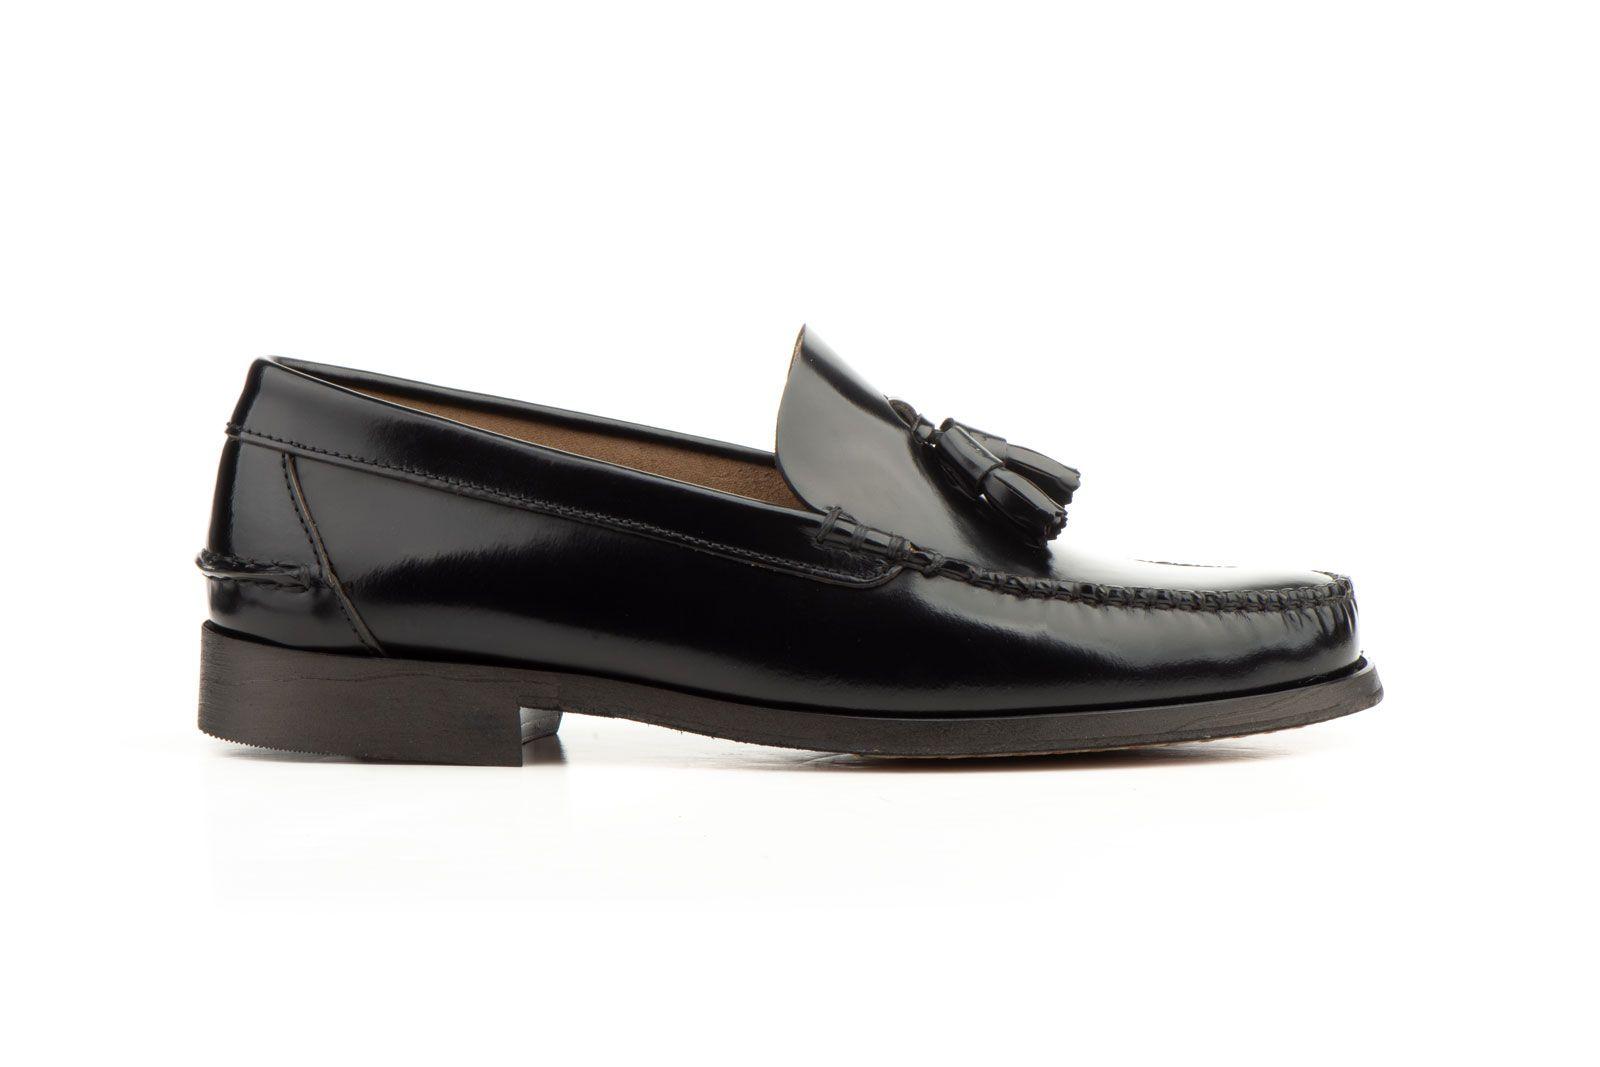 Purapiel Comfortable Loafer in Black